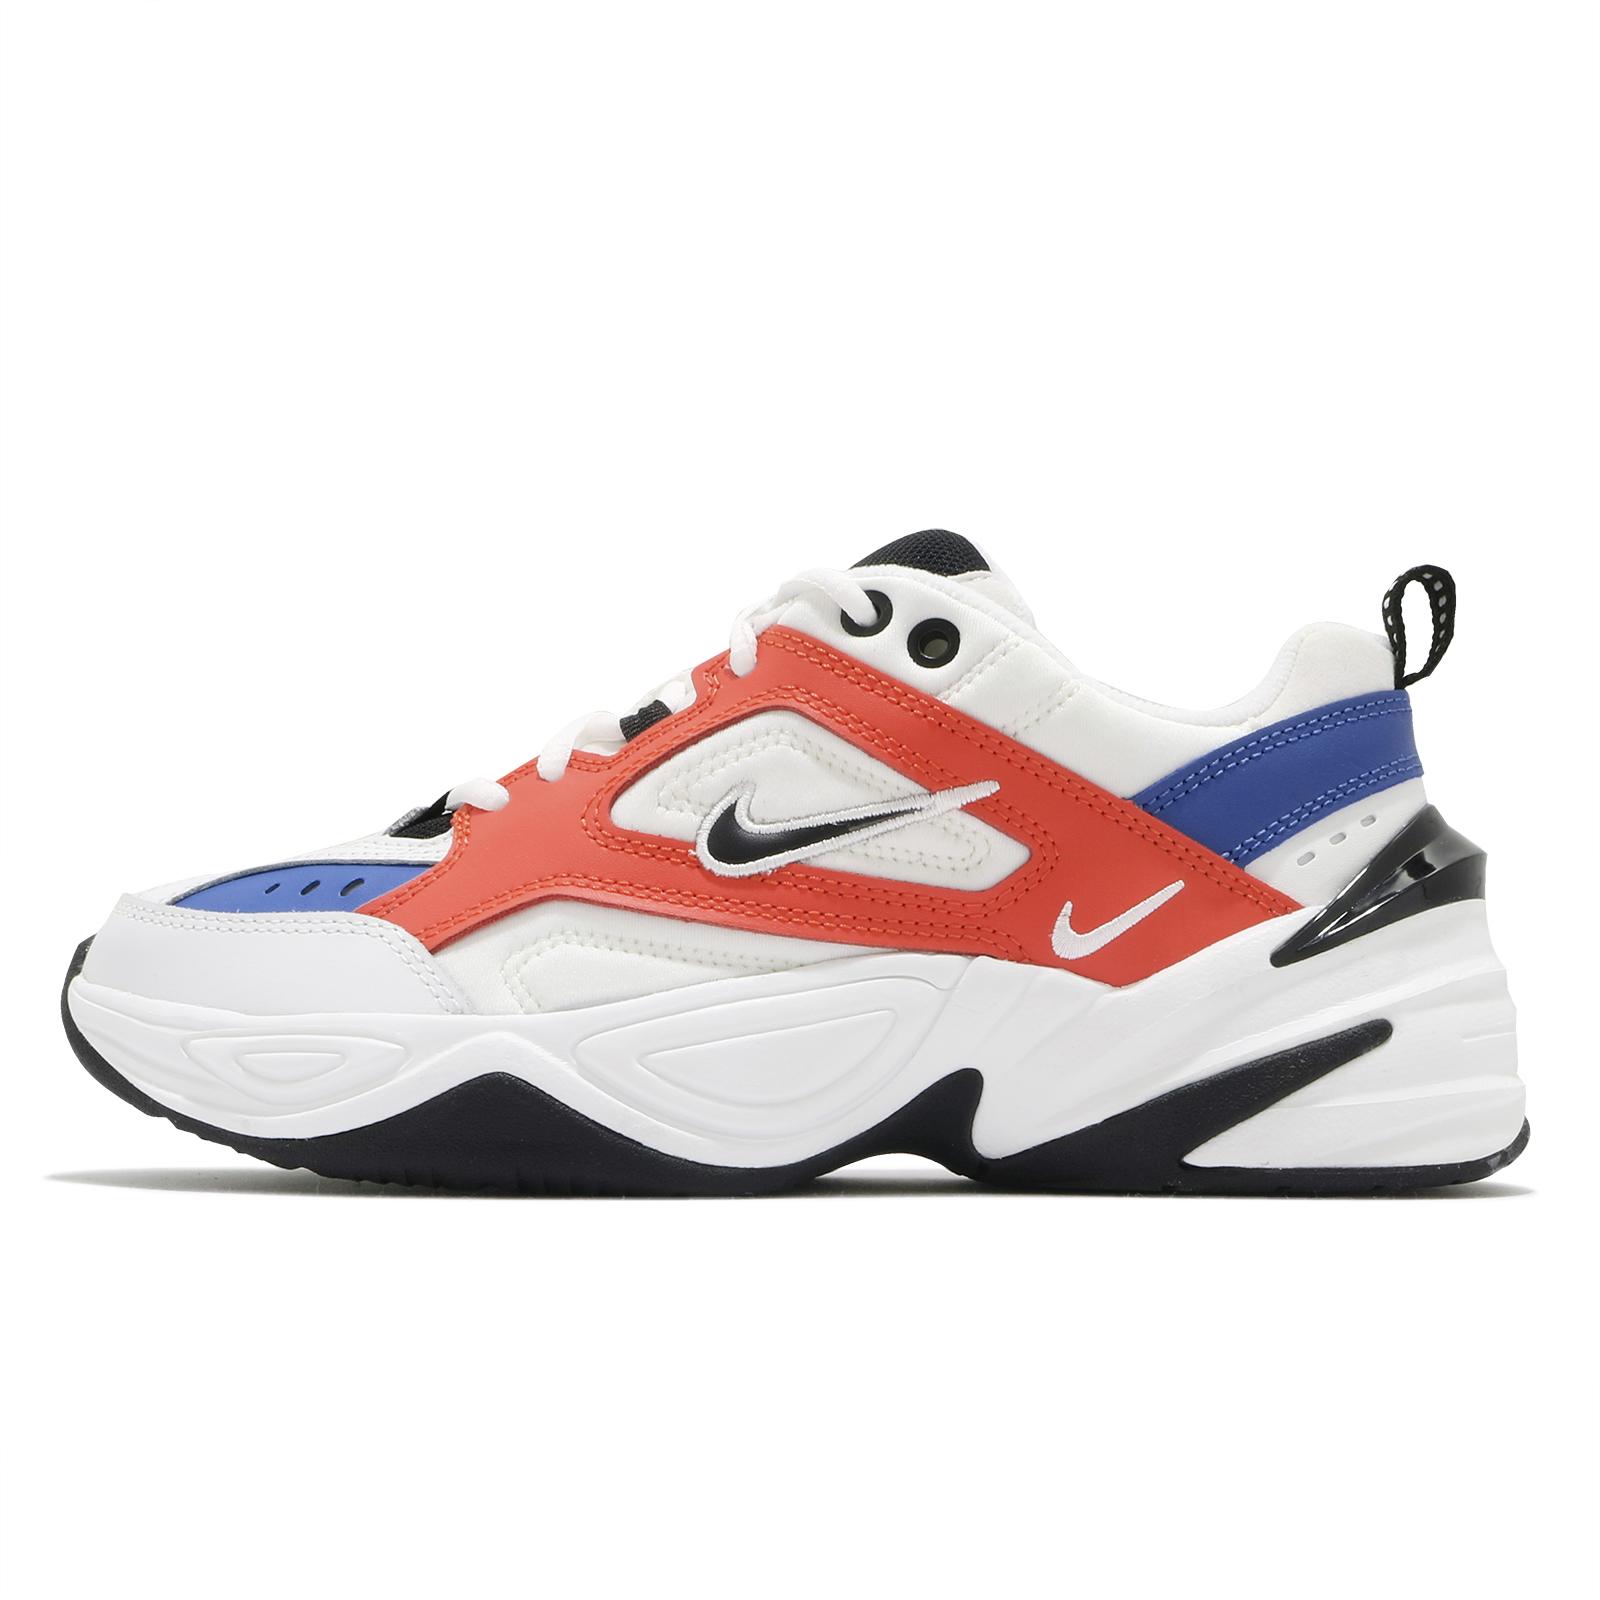 Nike 休閒鞋 Wmns M2K Tekno 白 橘 女鞋 復古慢跑鞋 老爹鞋 運動鞋【ACS】 AO3108-101